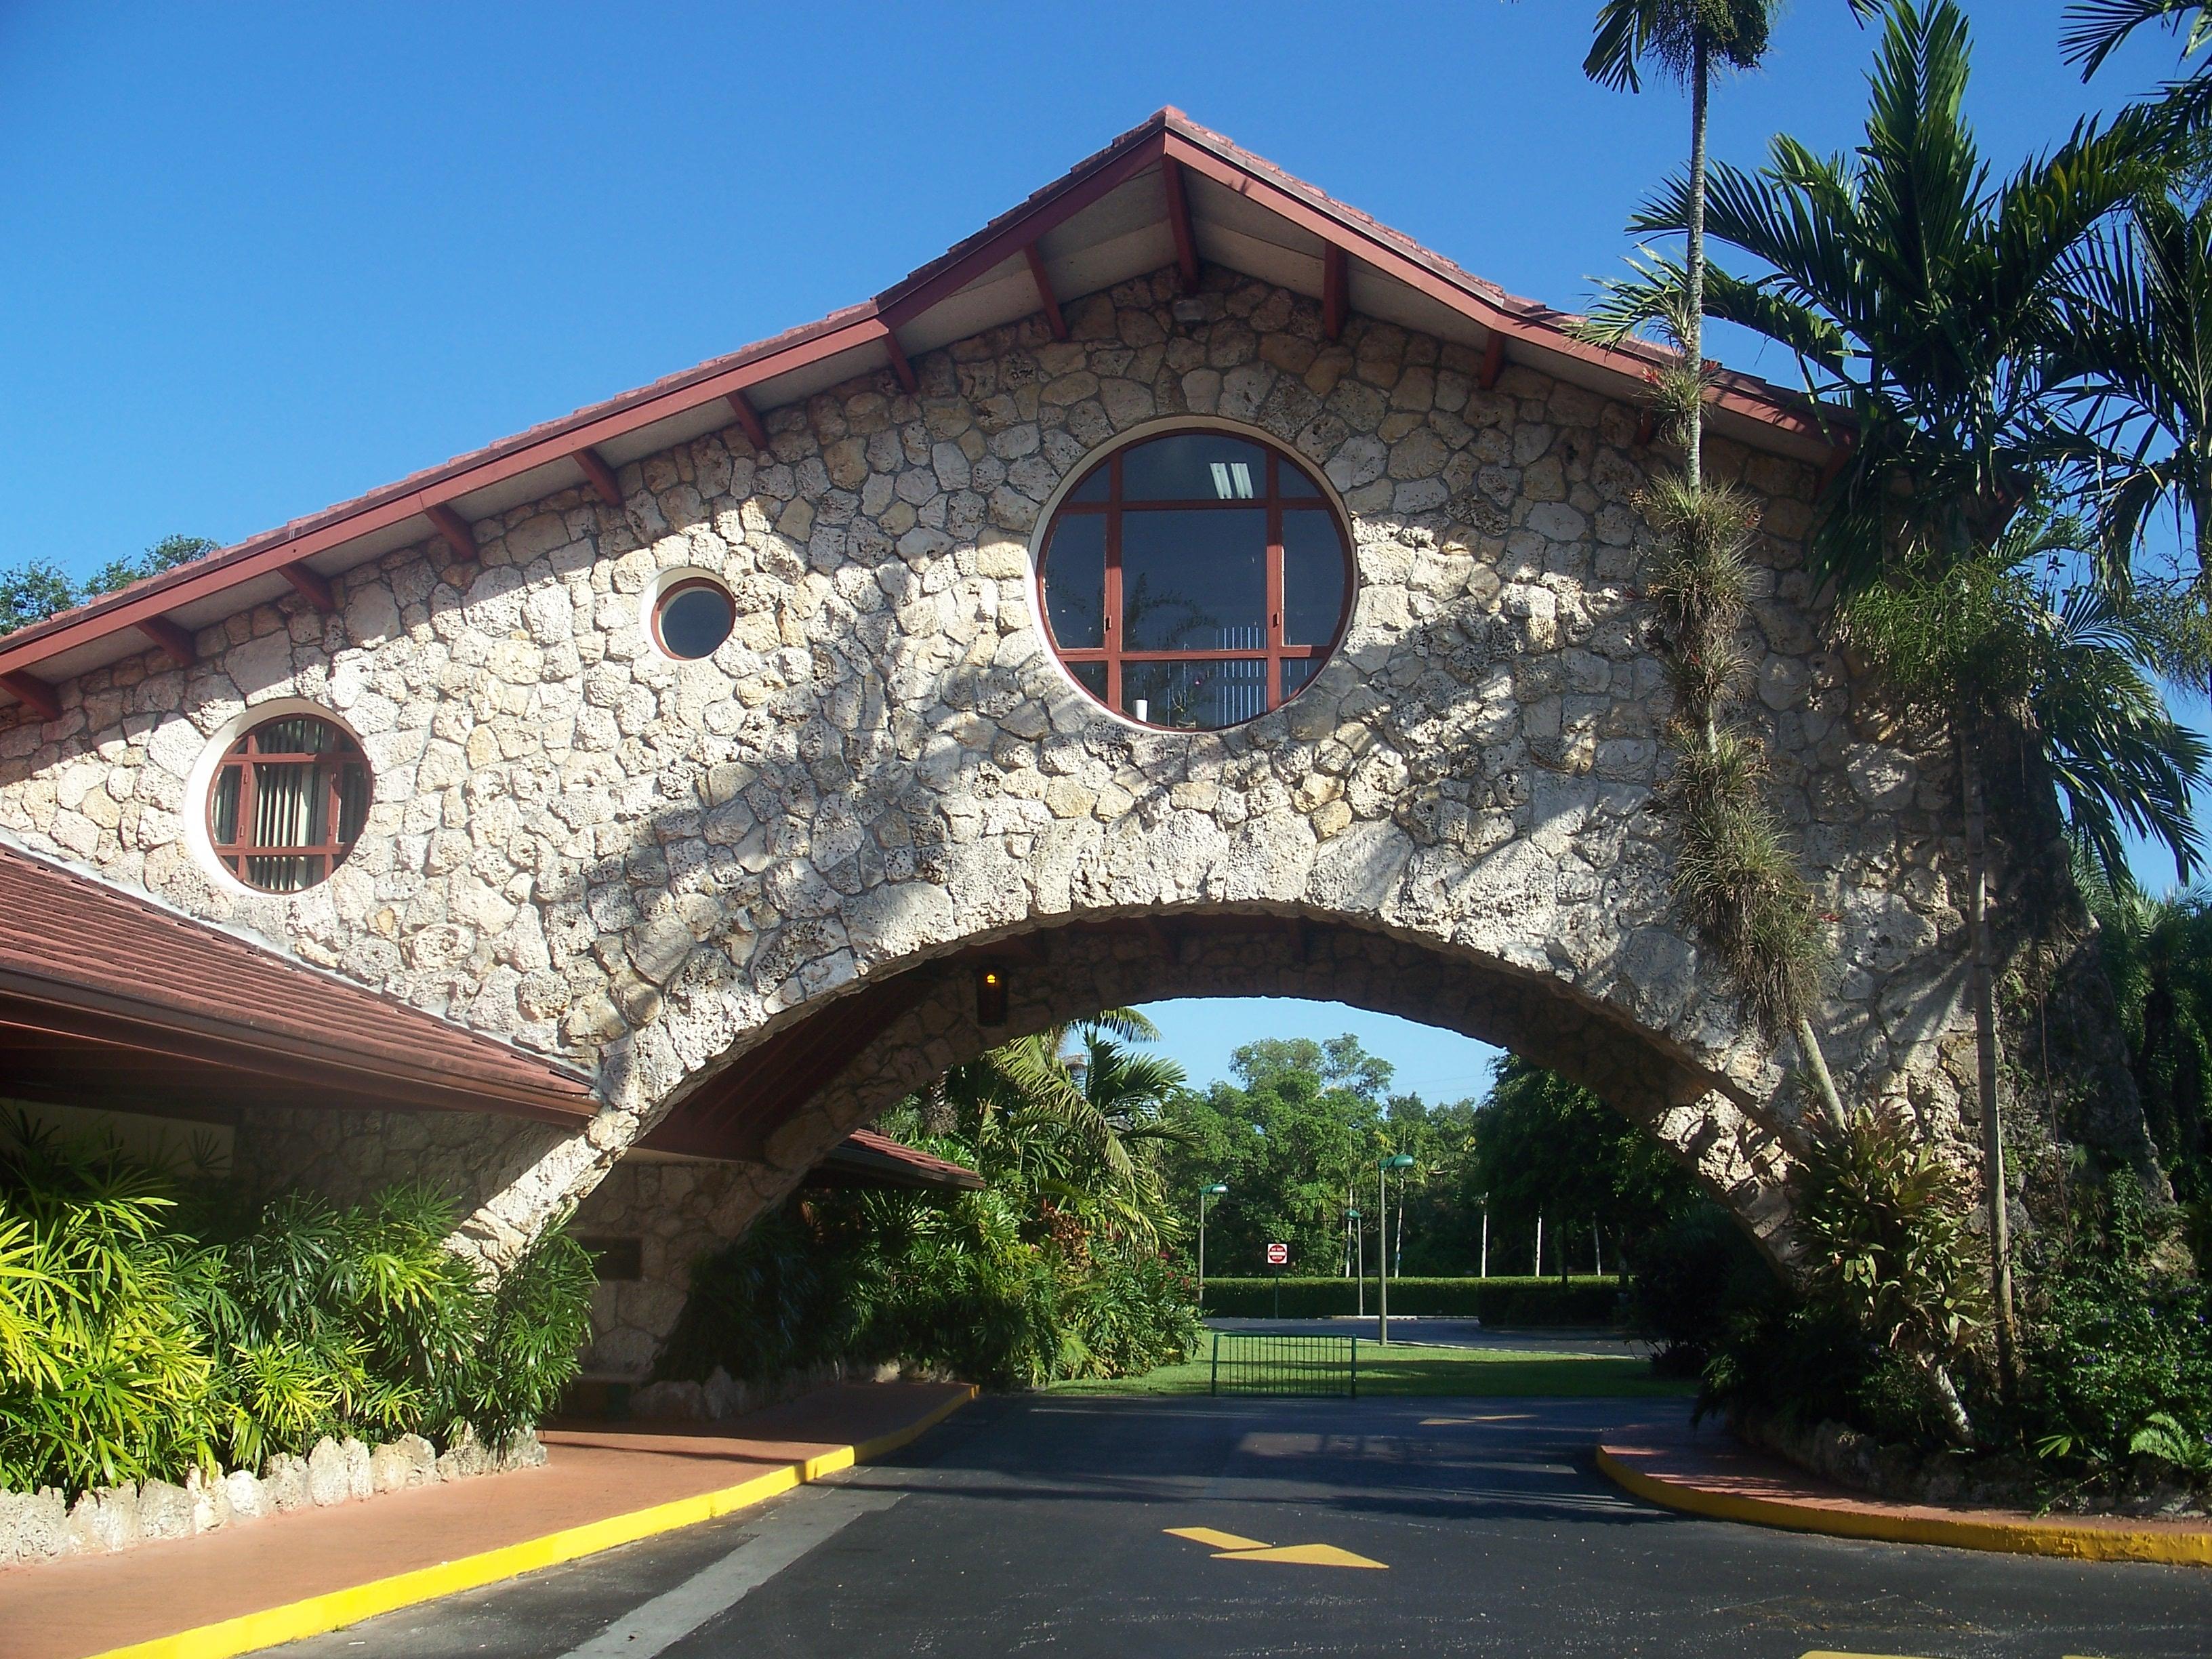 Park Miami Gardens File:pinecrest Gardens fl Park